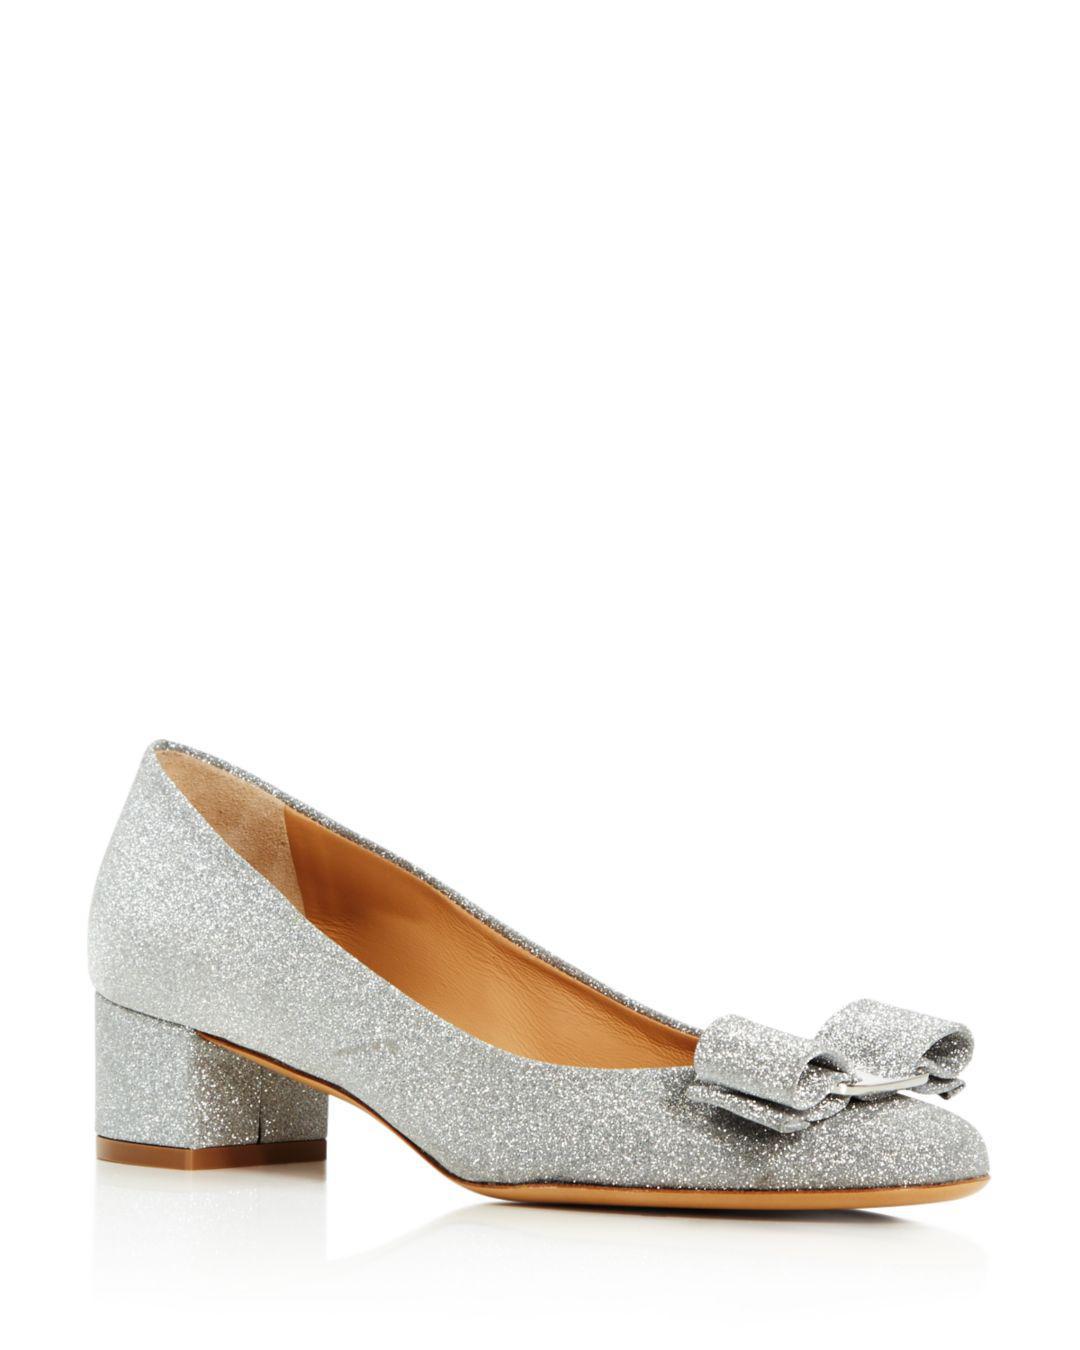 377a8bd9cc2 Lyst - Ferragamo Women s Vara Glitter Leather Block Heel Pumps